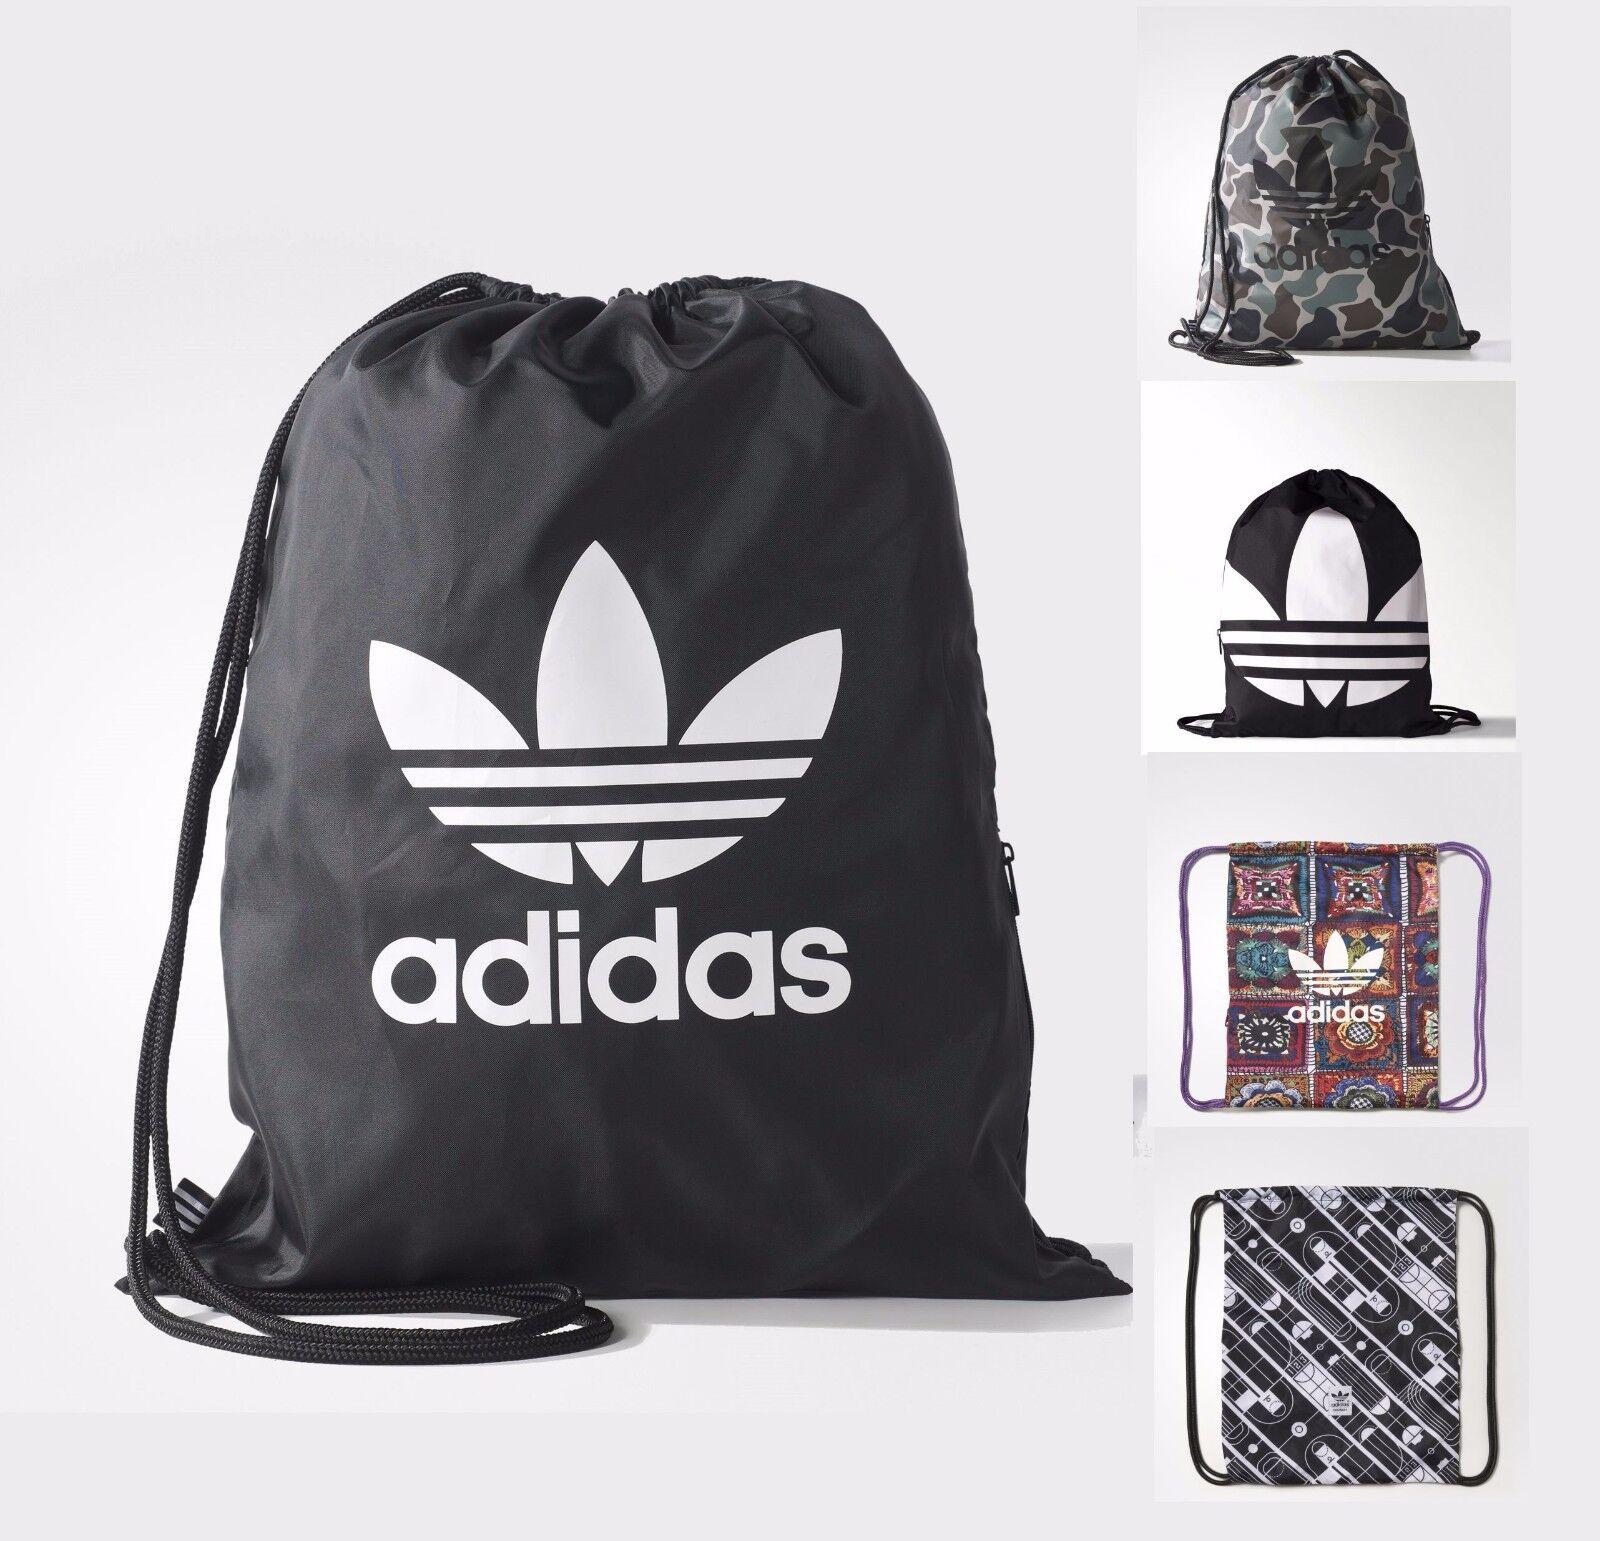 Adidas Originals ΓυμναστΞ�ριο ΓυμναστΞ�ριο τσάντα Sack Farm Crochita Camo Μαύρο Floral Ξ'Ξ½Ξ΄ΟΟŽΞ½ ΓυναίκΡς